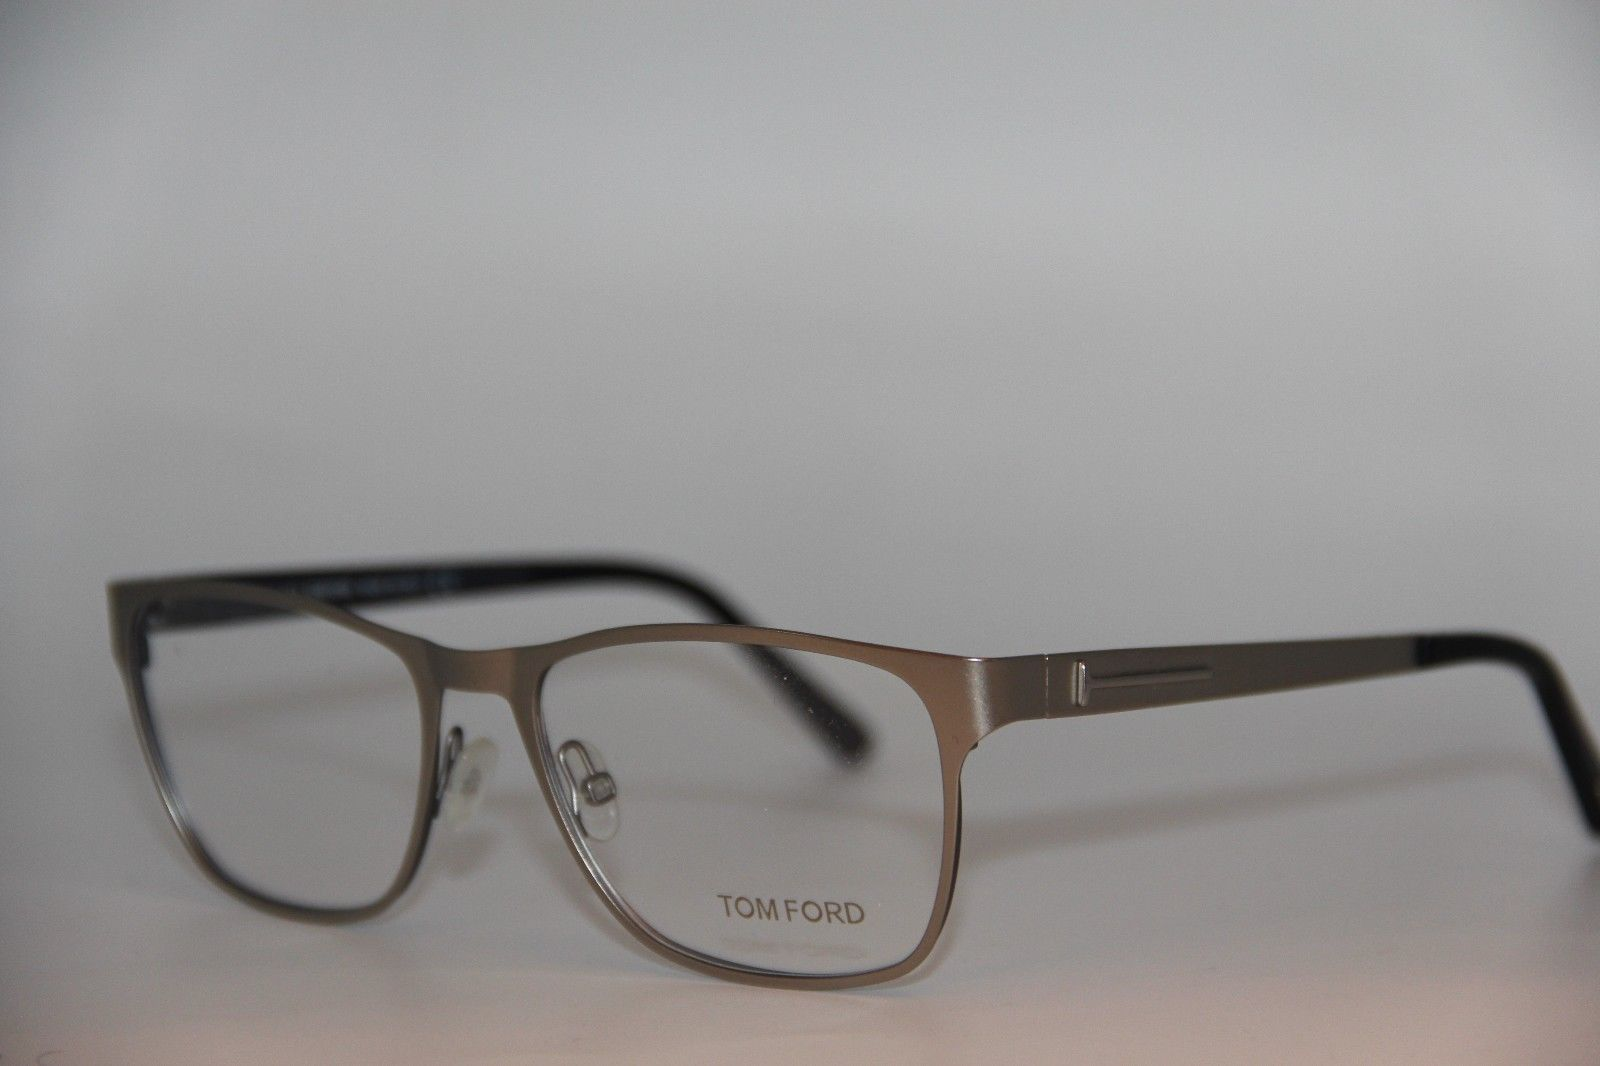 74d487cb4da9b New Tom Ford Tf 5242 020 Gunmetal Eyeglasses and 50 similar items